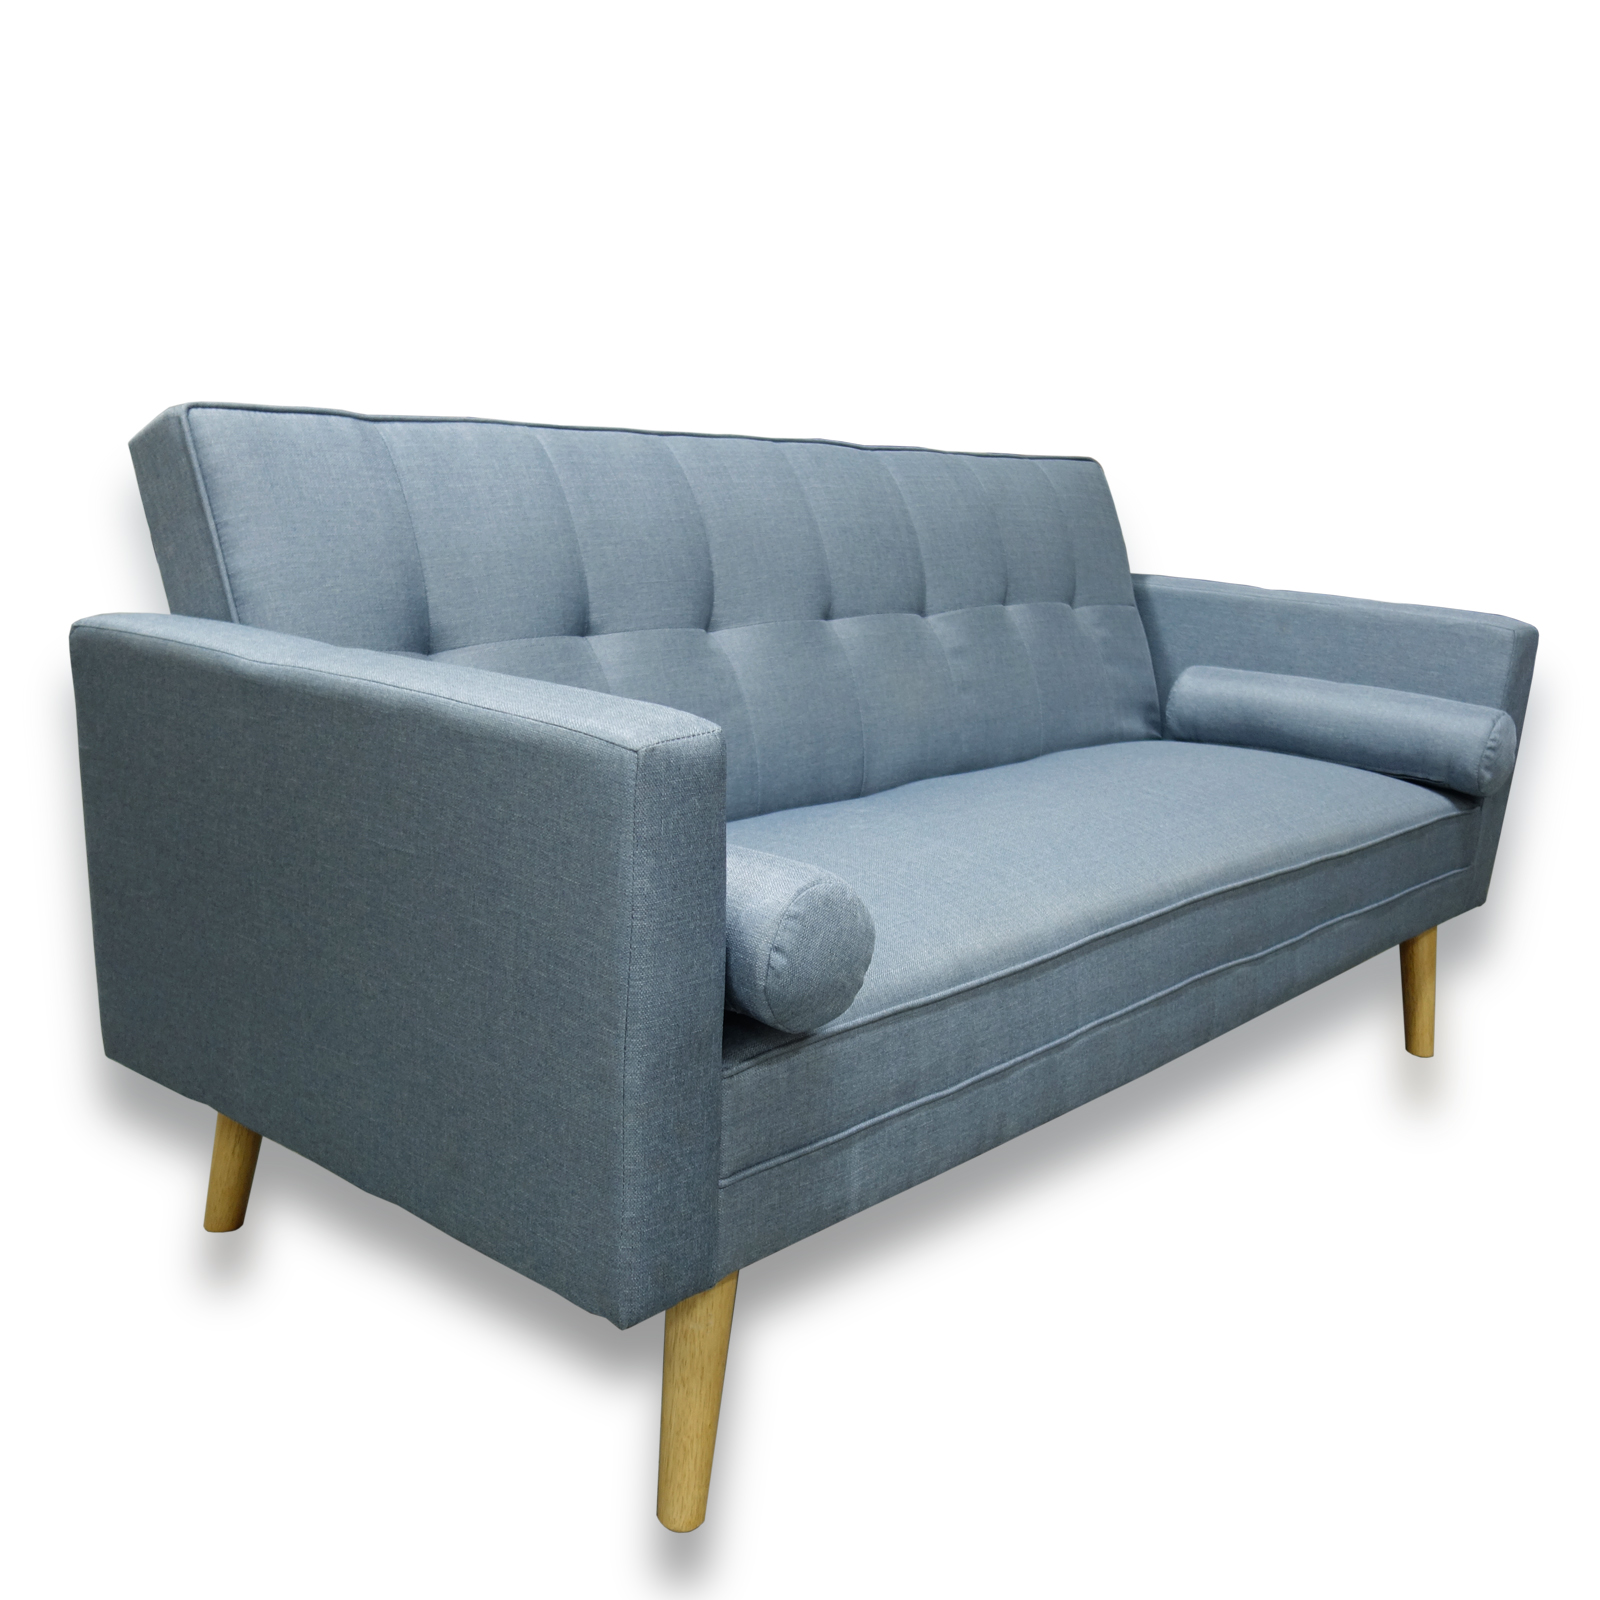 Amy Contemporary Scandinavian Fabric Clack 3 Seater Sofa Bed